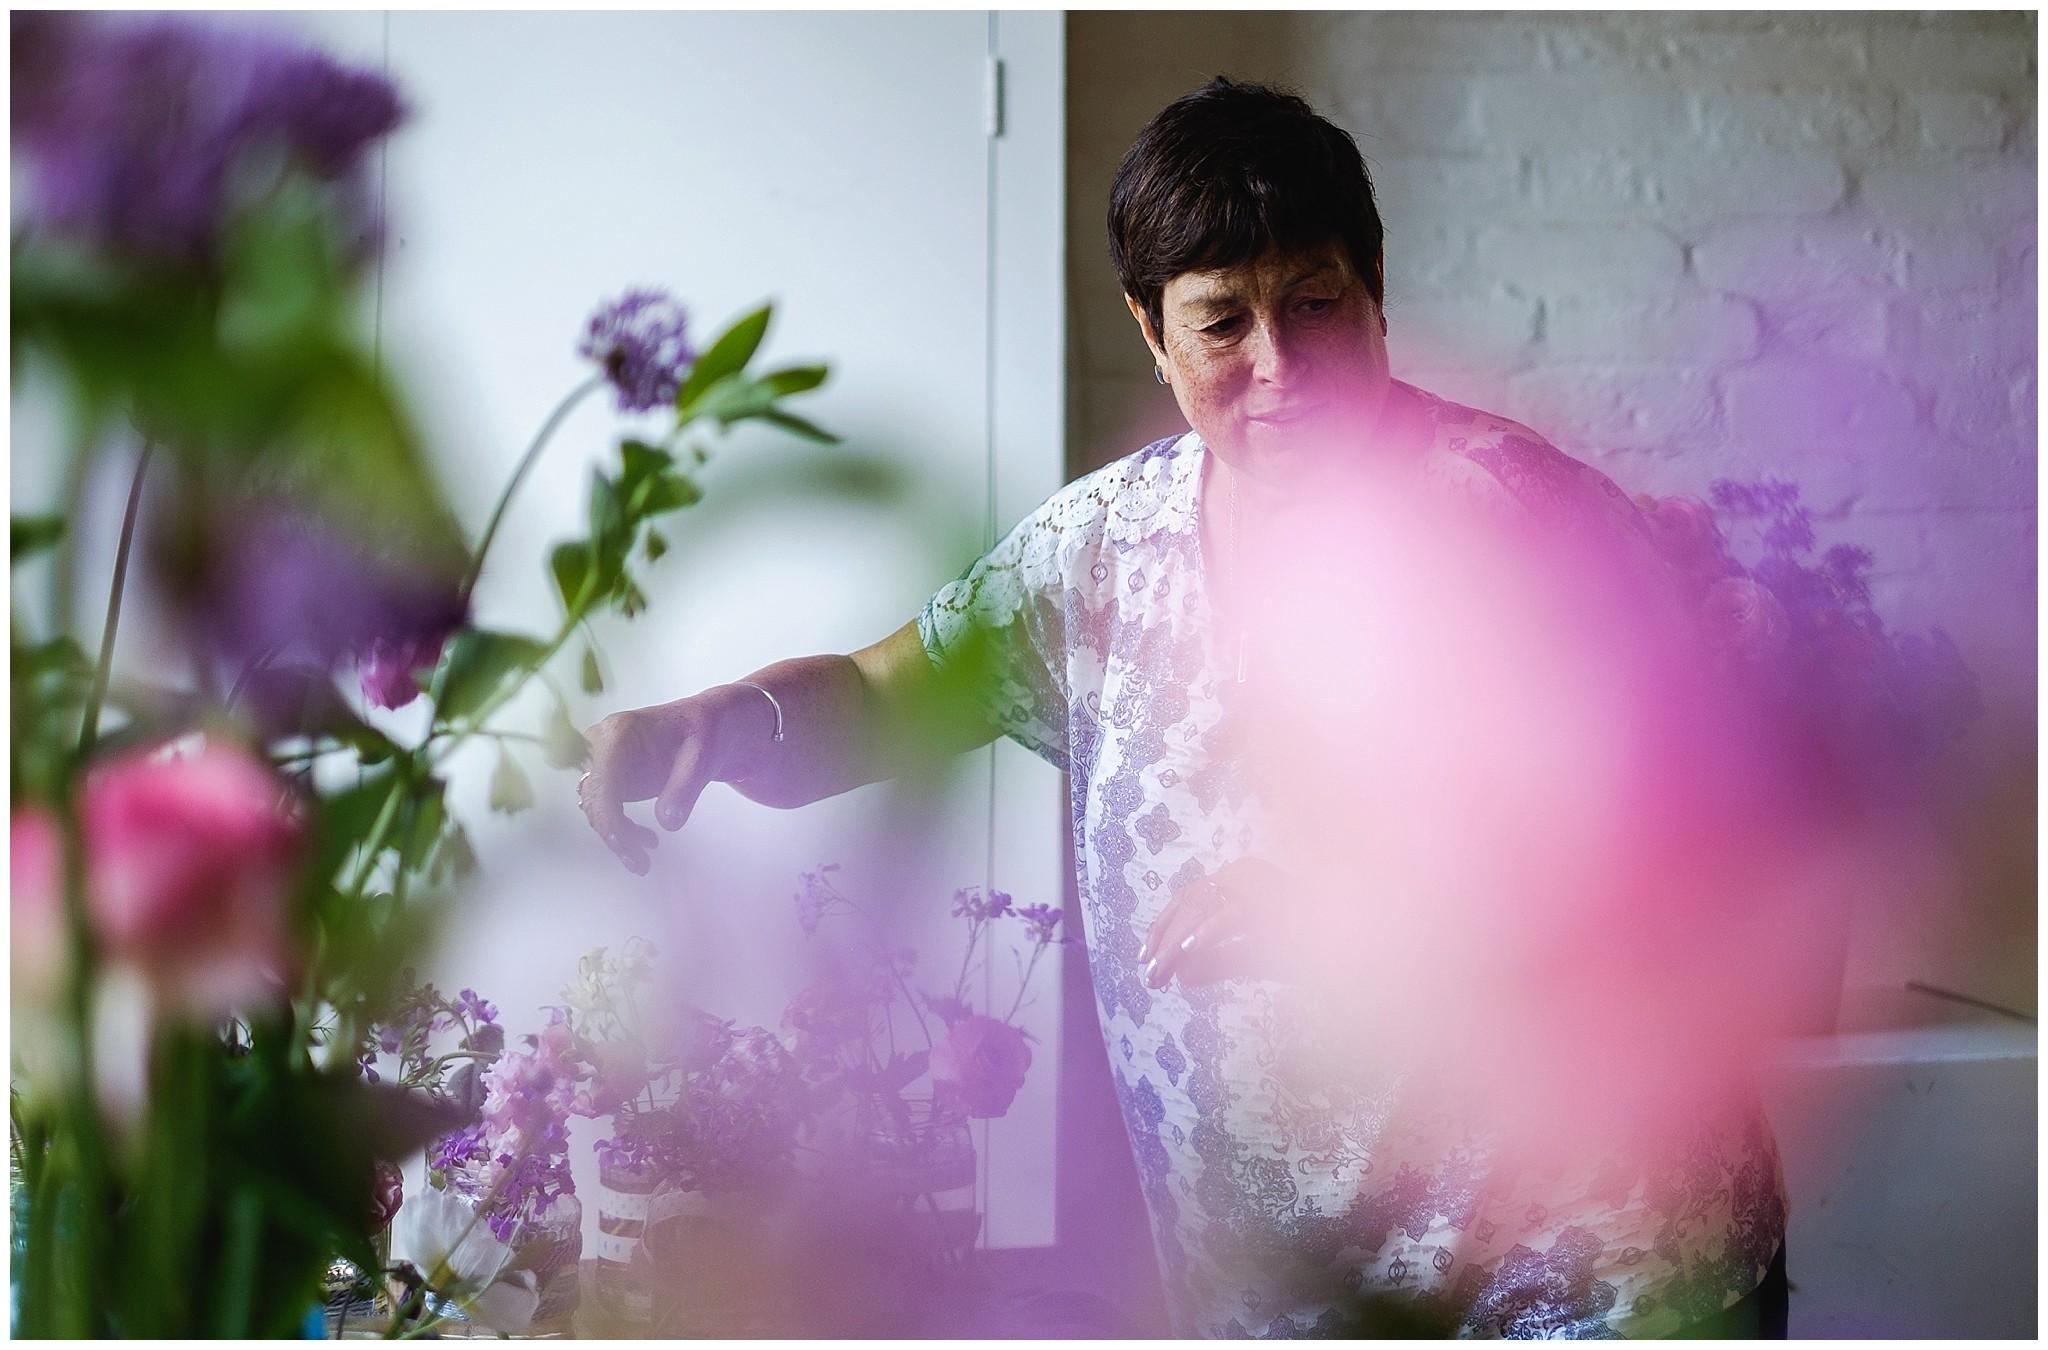 mum prepares wedding flowers